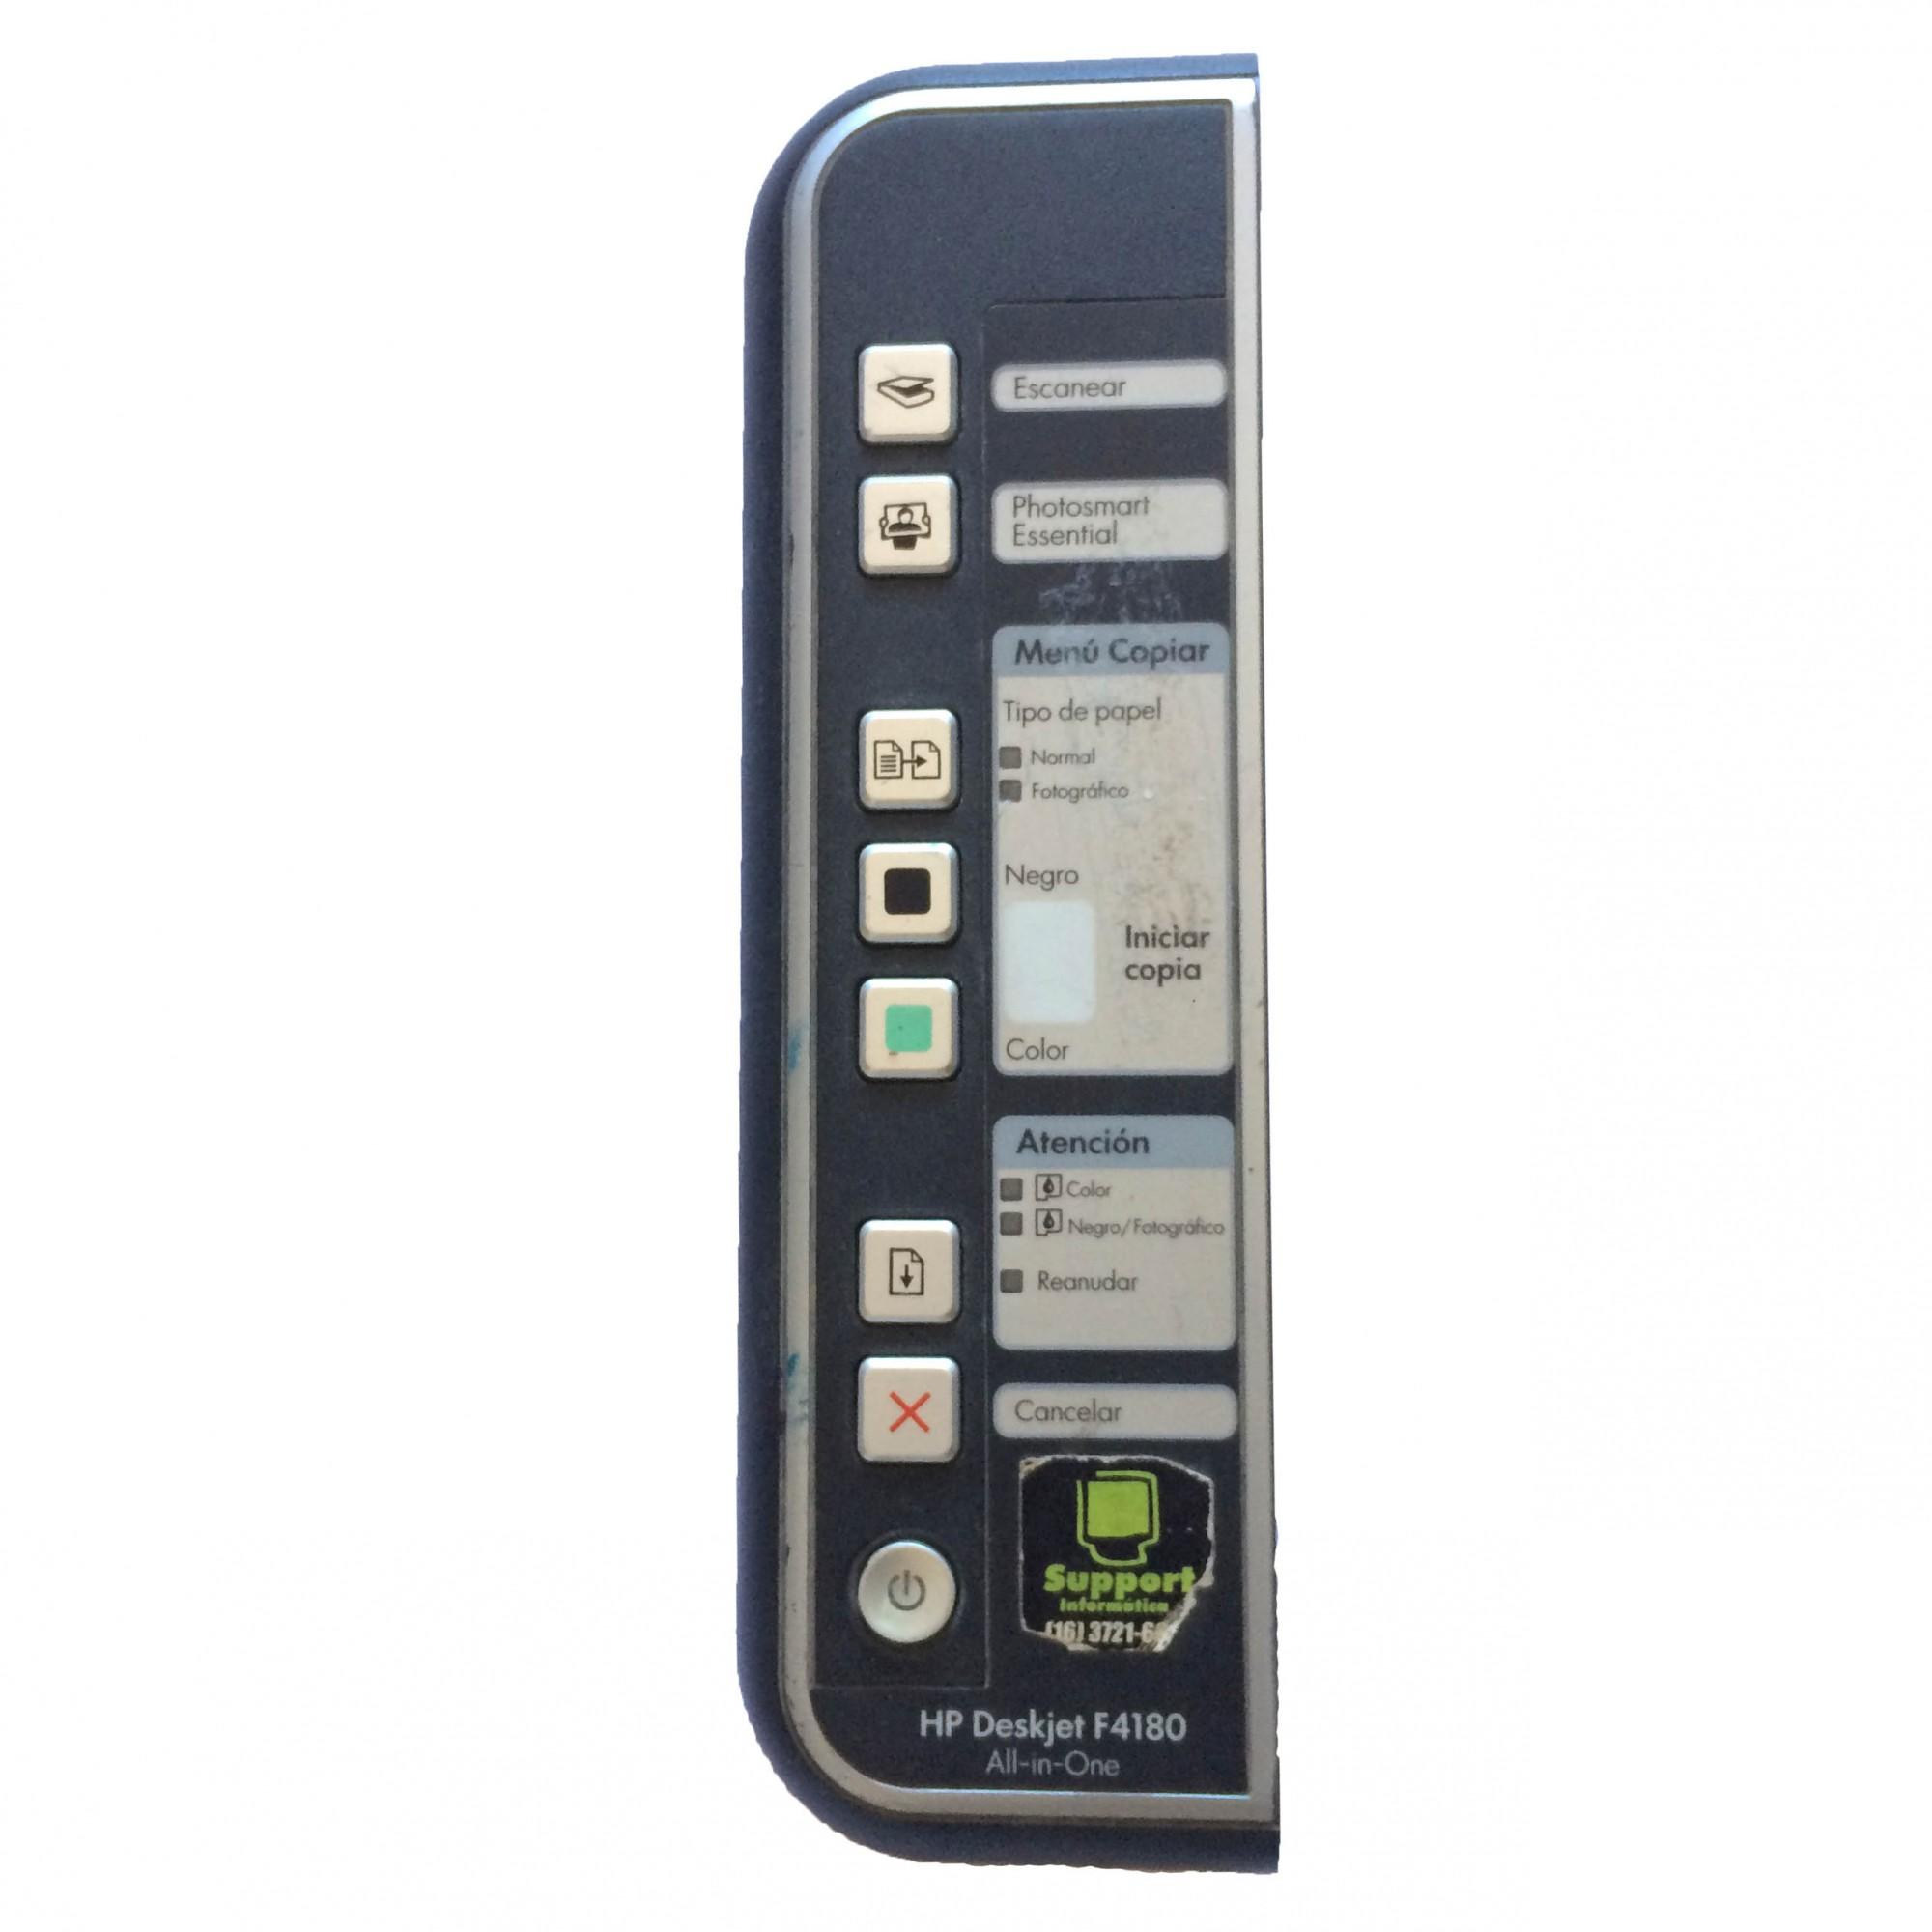 Painel Frontal Completo + Placa Multifuncional HP Deskjet F4180 All-in-One - Retirado